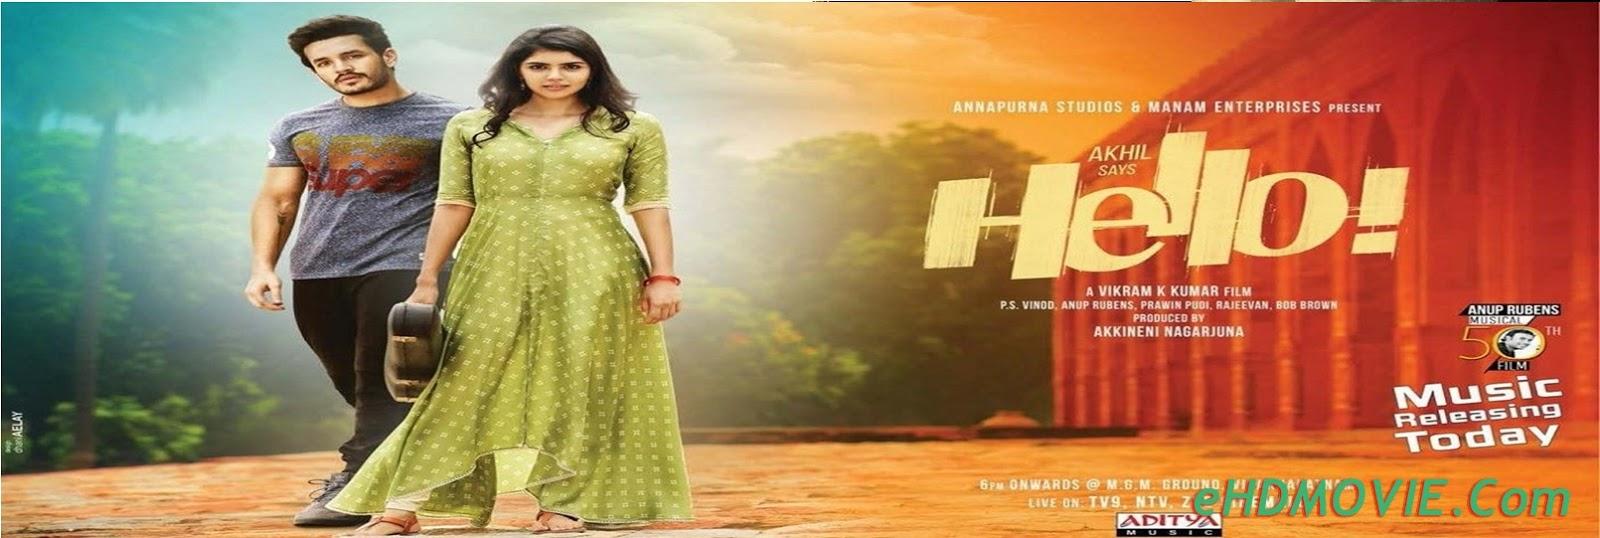 Taqdeer [Hello] 2017 Full Movie Dual Audio [Hindi – Telugu] 1080p - 720p - 480p ORG BRRip 350MB - 950MB – 3.9GB ESubs Free Download